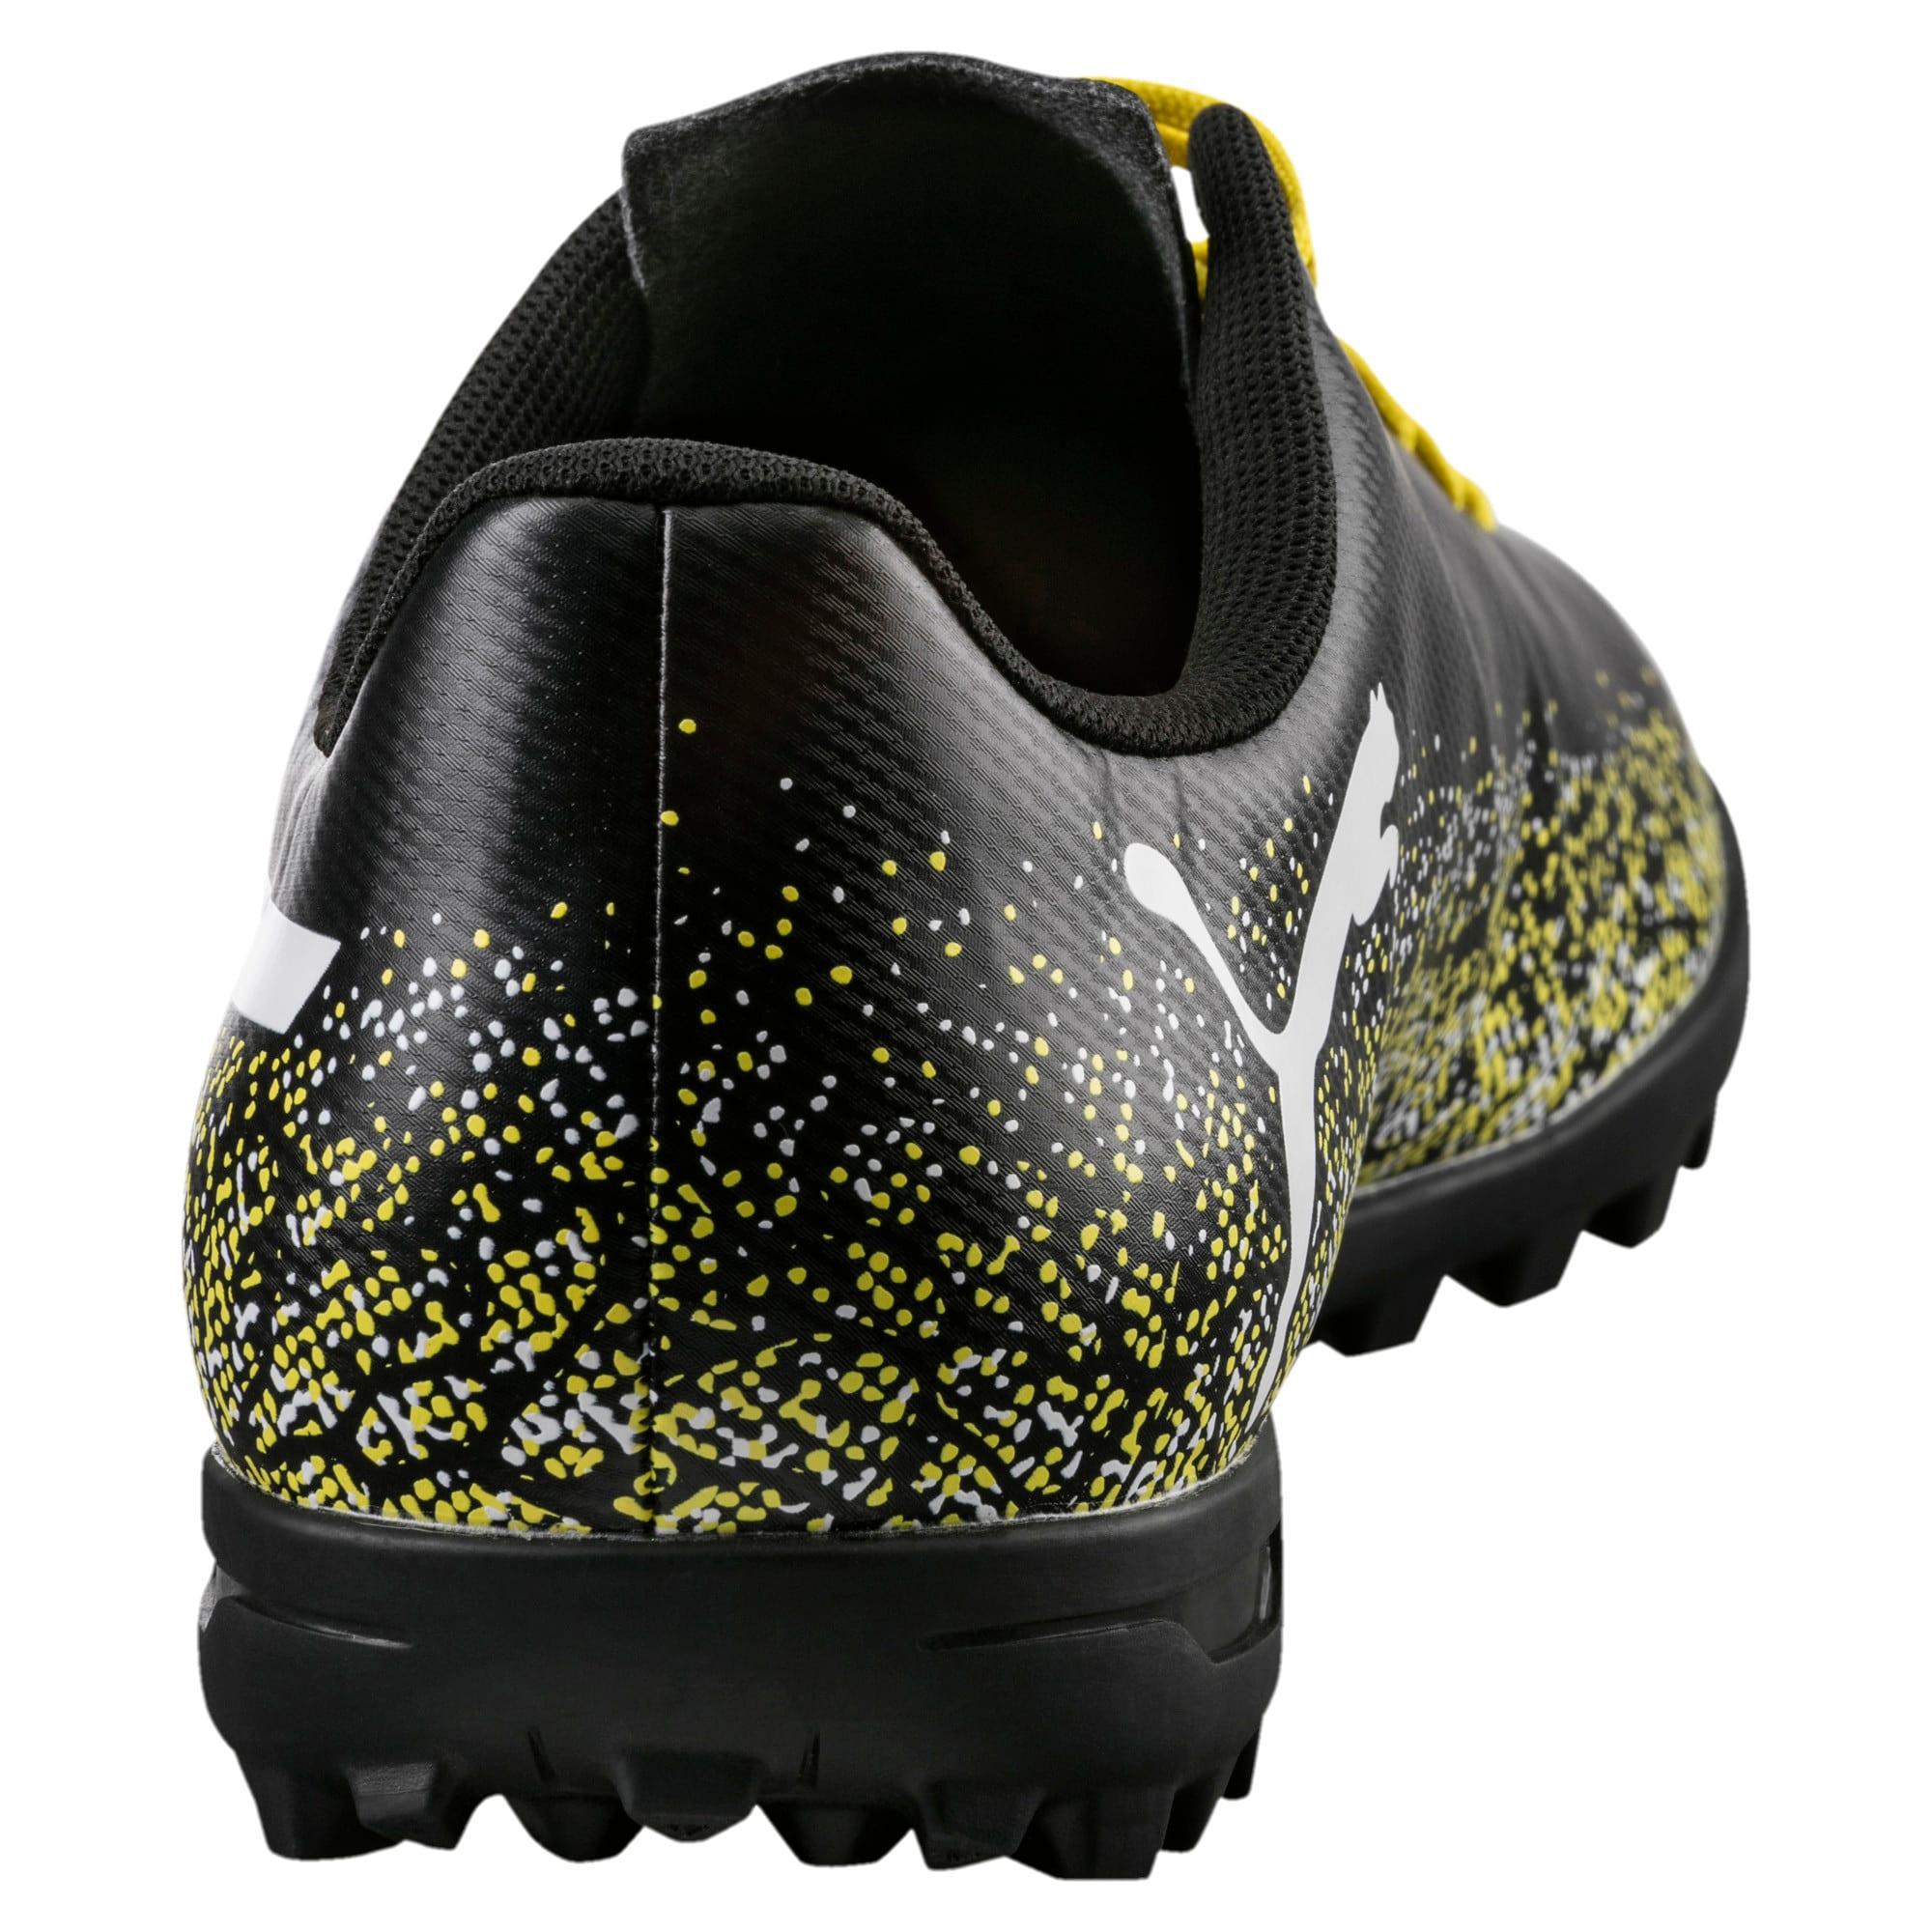 Thumbnail 4 of Truora TT Men's Football Boots, Black-White-Blazing Yellow, medium-IND